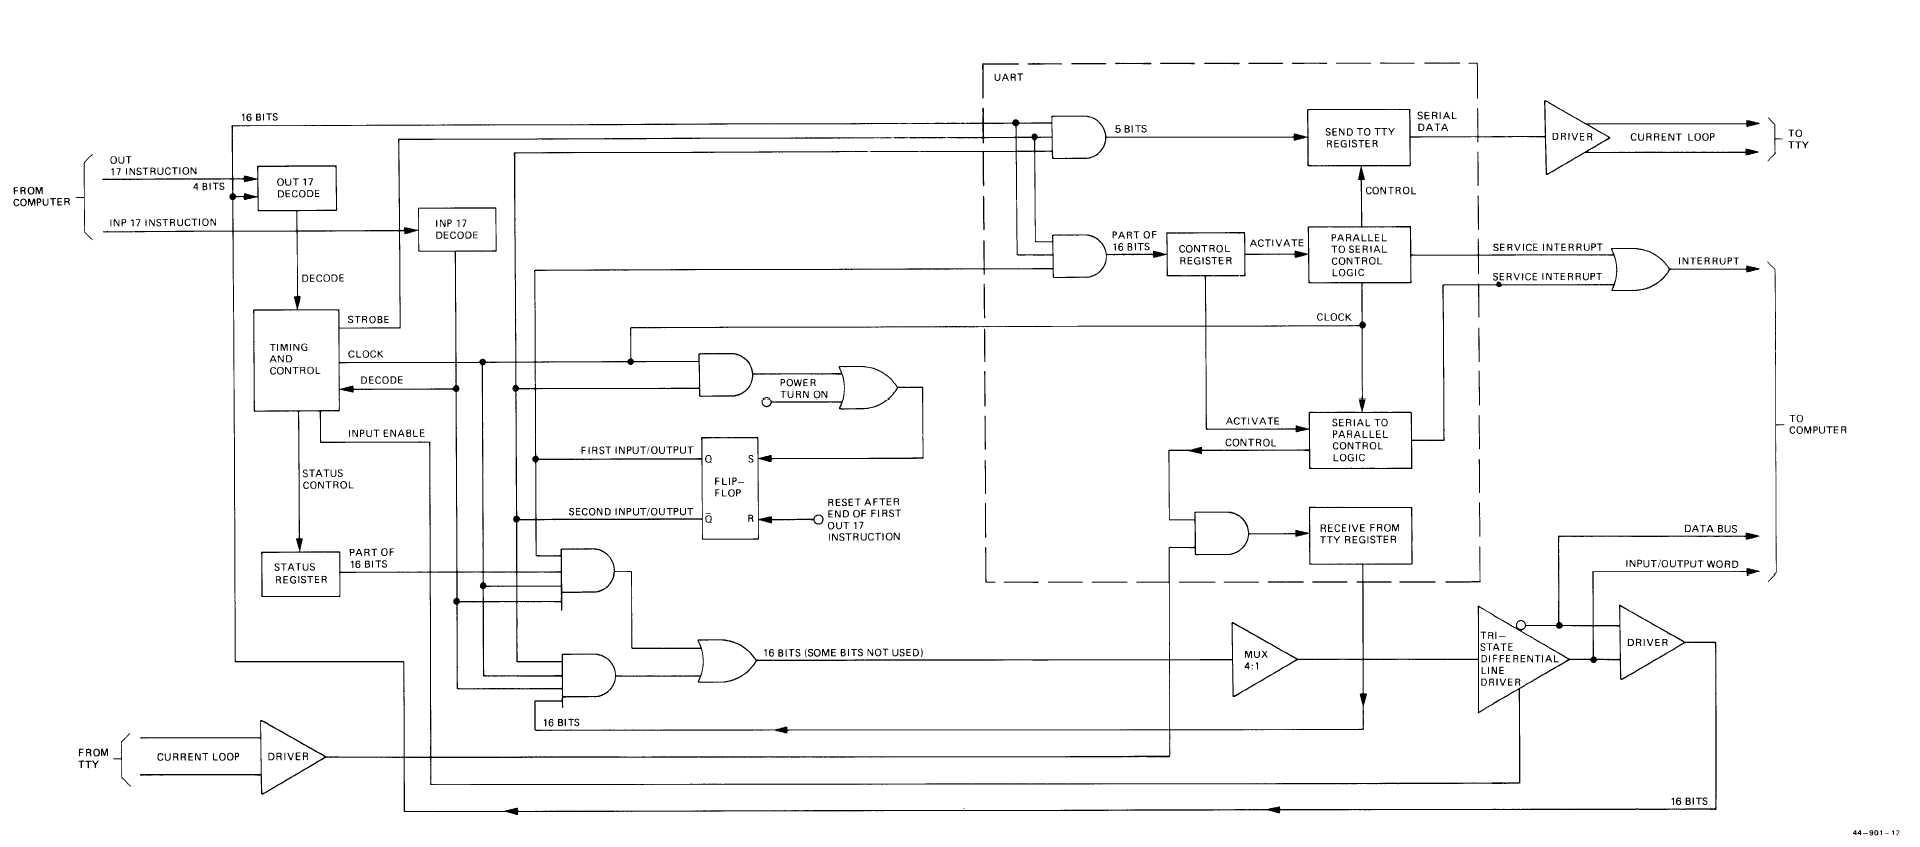 Fo9 Teletypewriter Control Logic Functional Block Diagram Army Tm 5 6675 238 14 Marine Corps 08839a 1 Fp 17 18 Blank